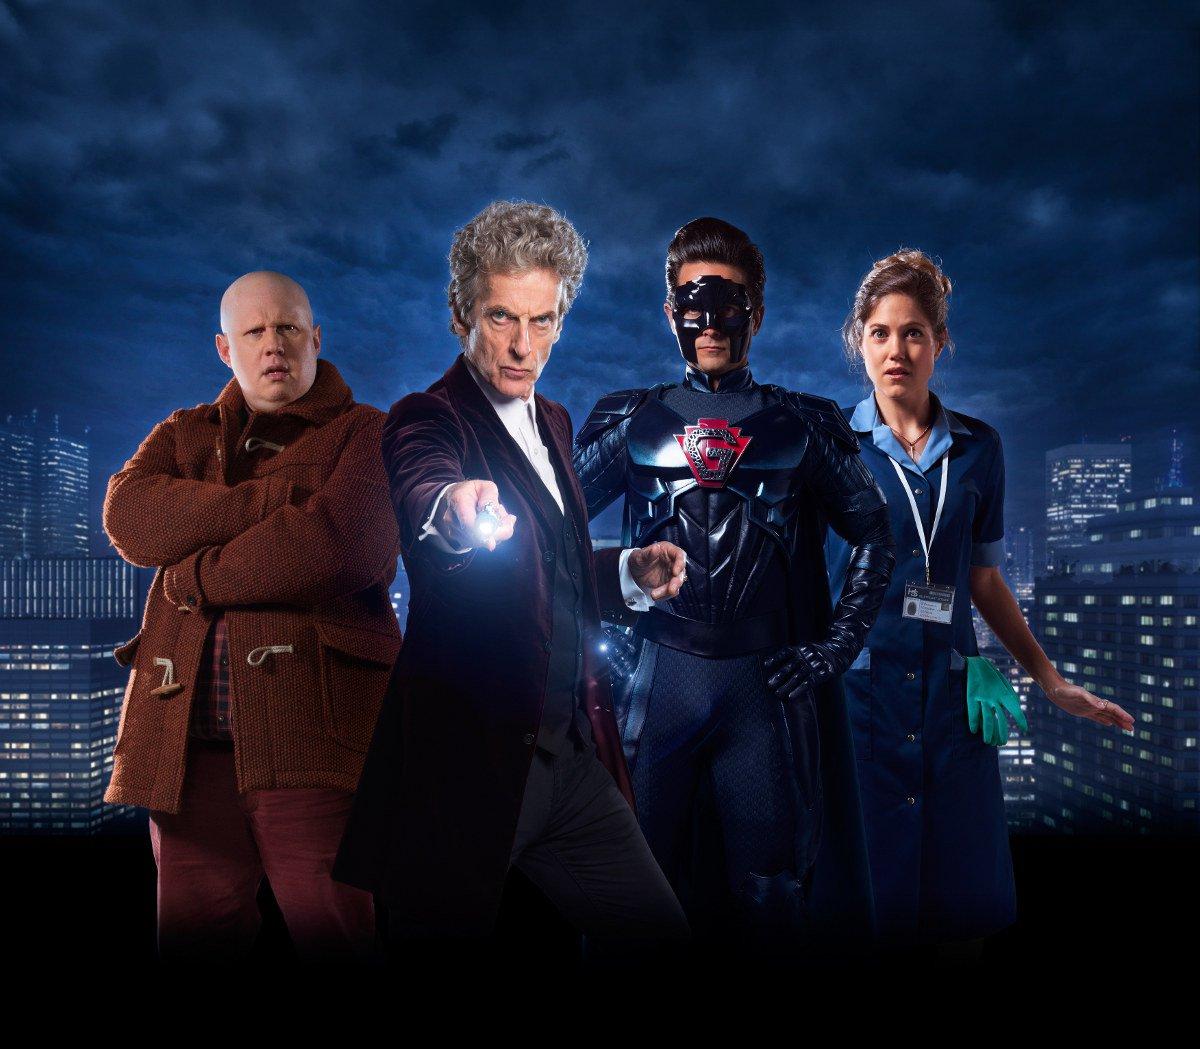 return-of-doctor-mysterio-12th-twelfth-peter-capaldi-charity-wakefield